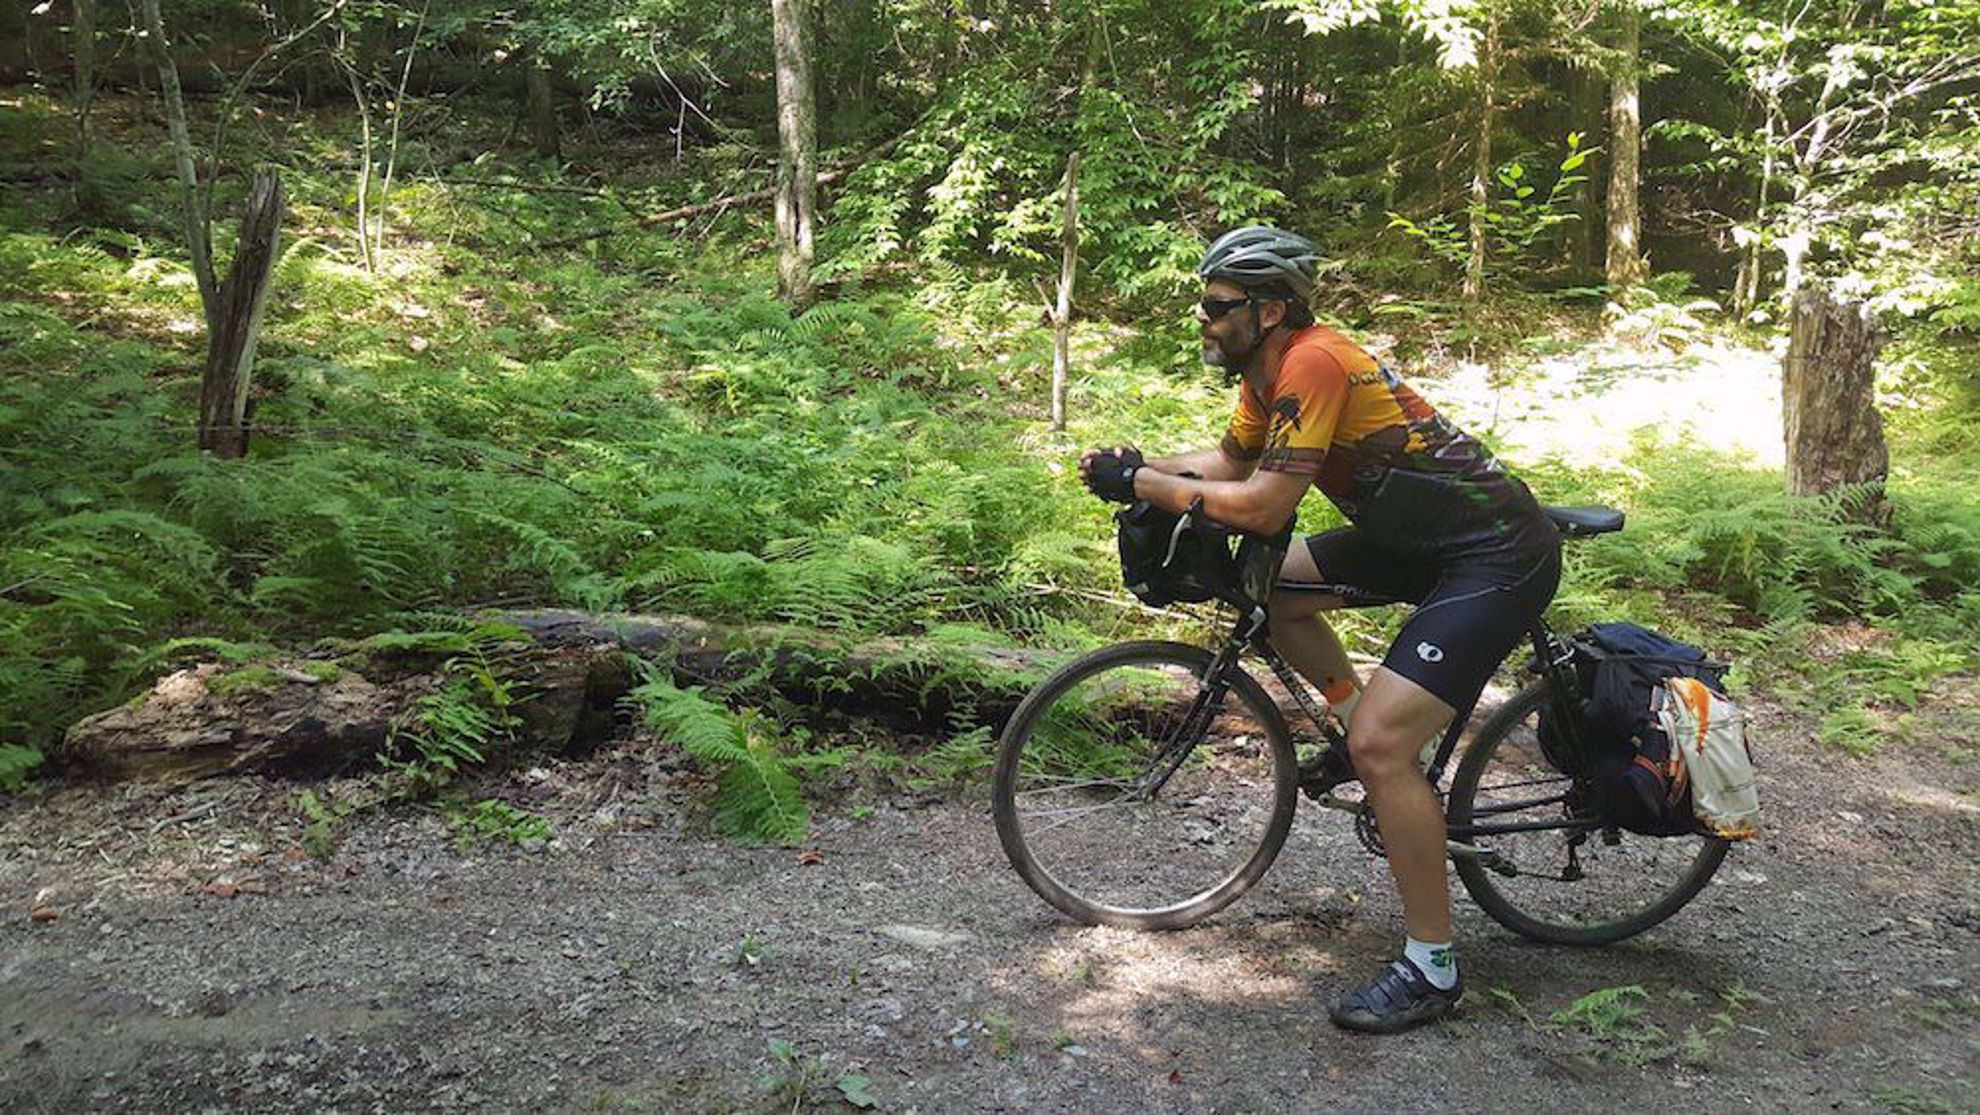 Biking the gravel